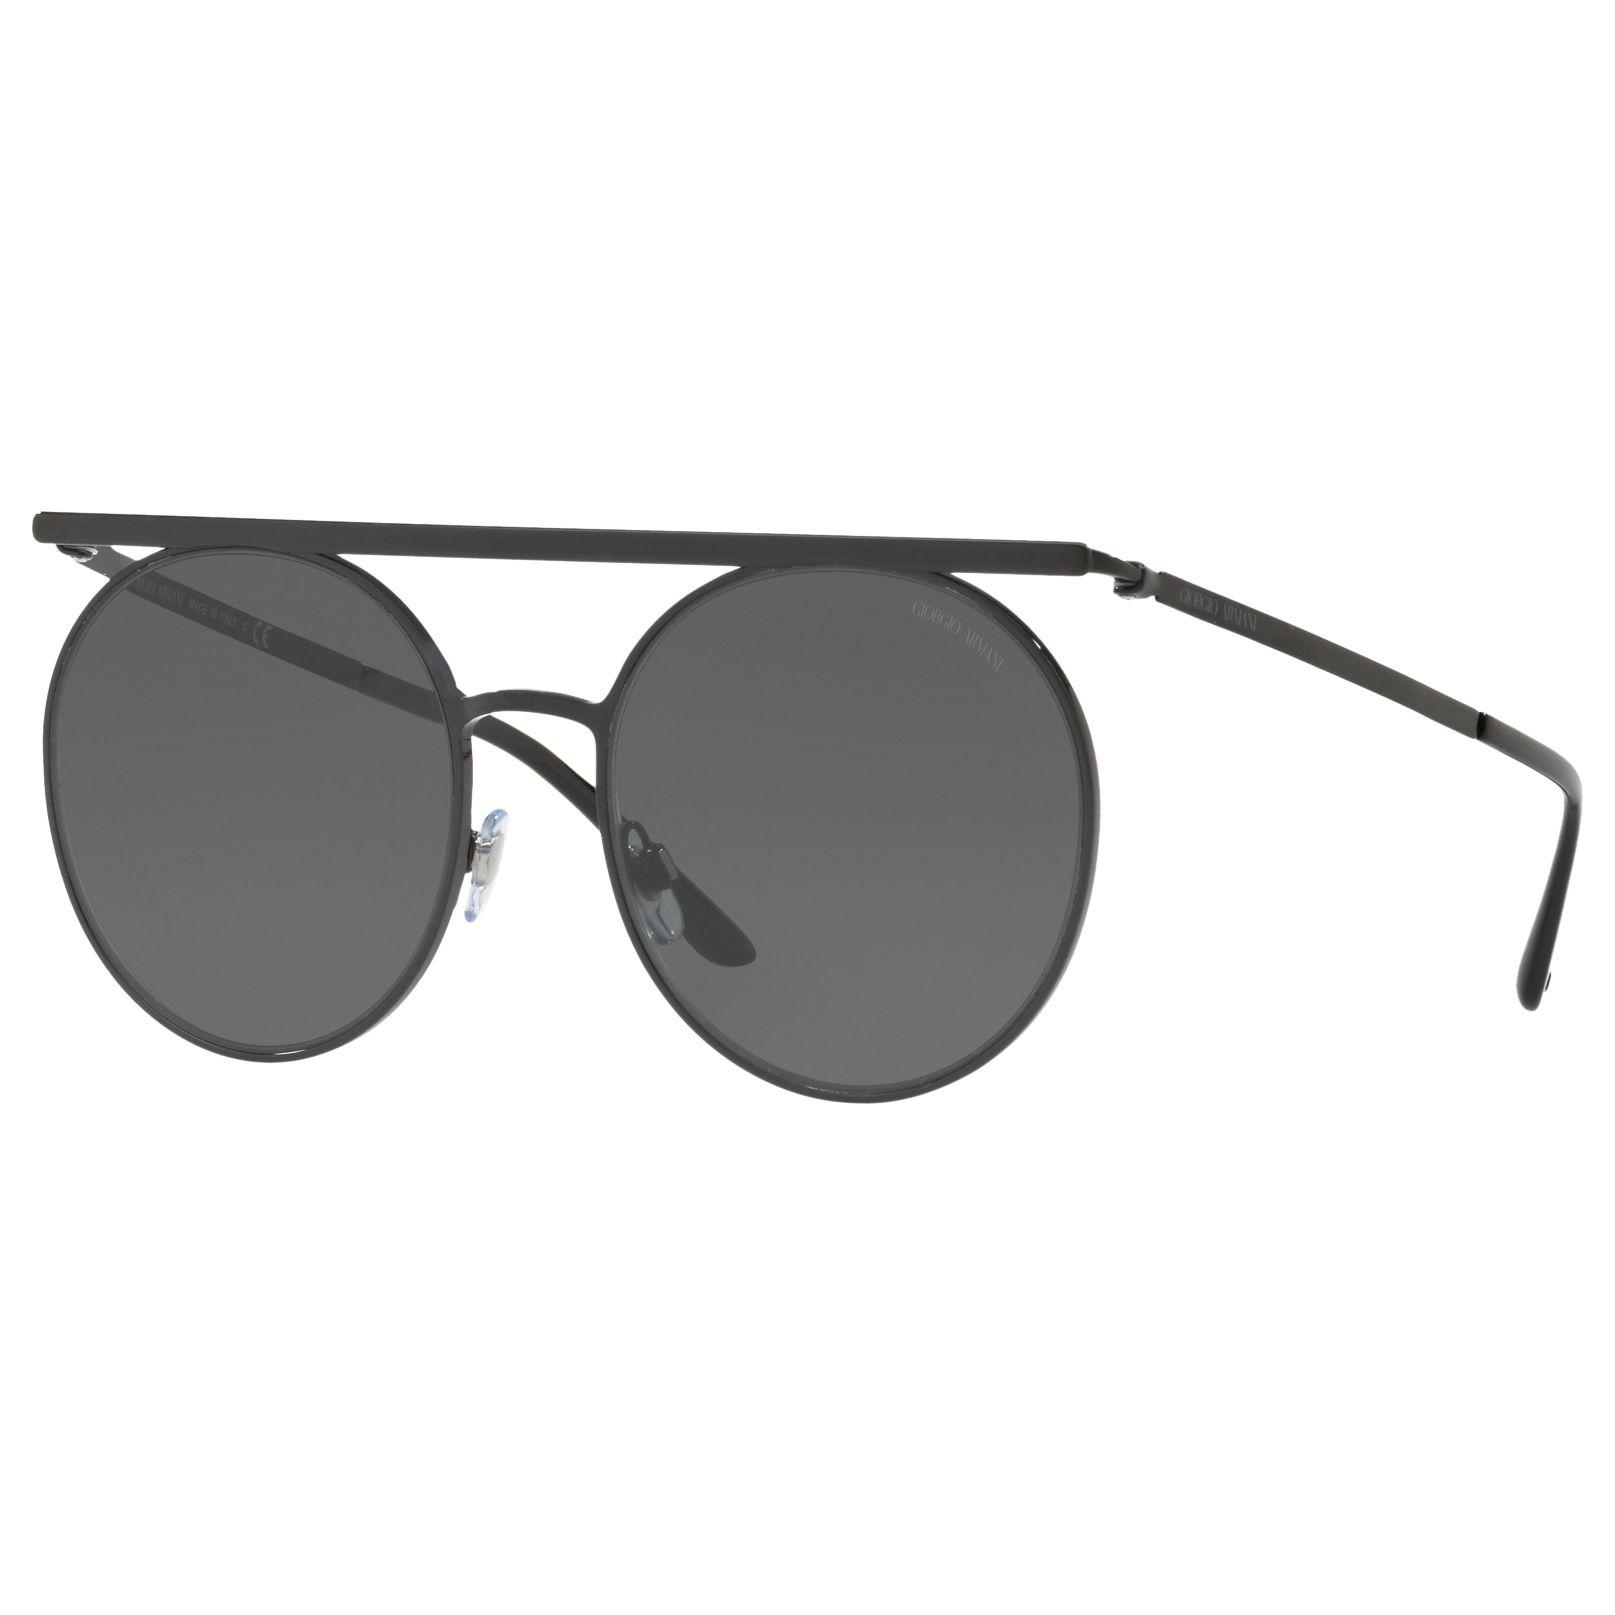 Giorgio Armani Giorgio Armani AR6069 Round Sunglasses, Black